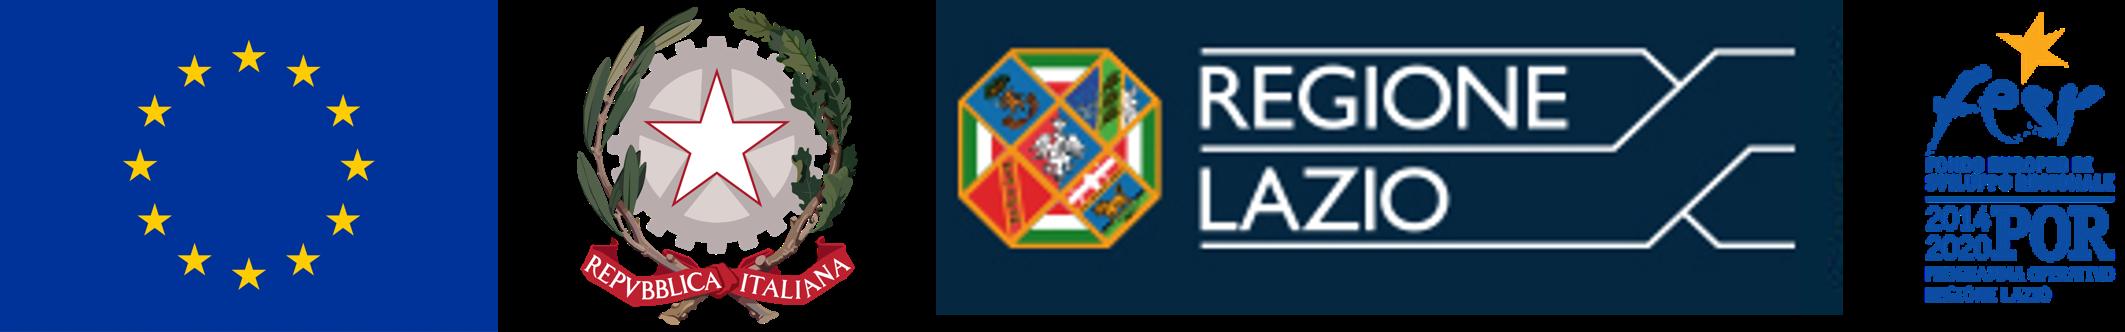 POR FESR Lazio 2014/2020 – Bando KETs – Tecnologie Abilitanti